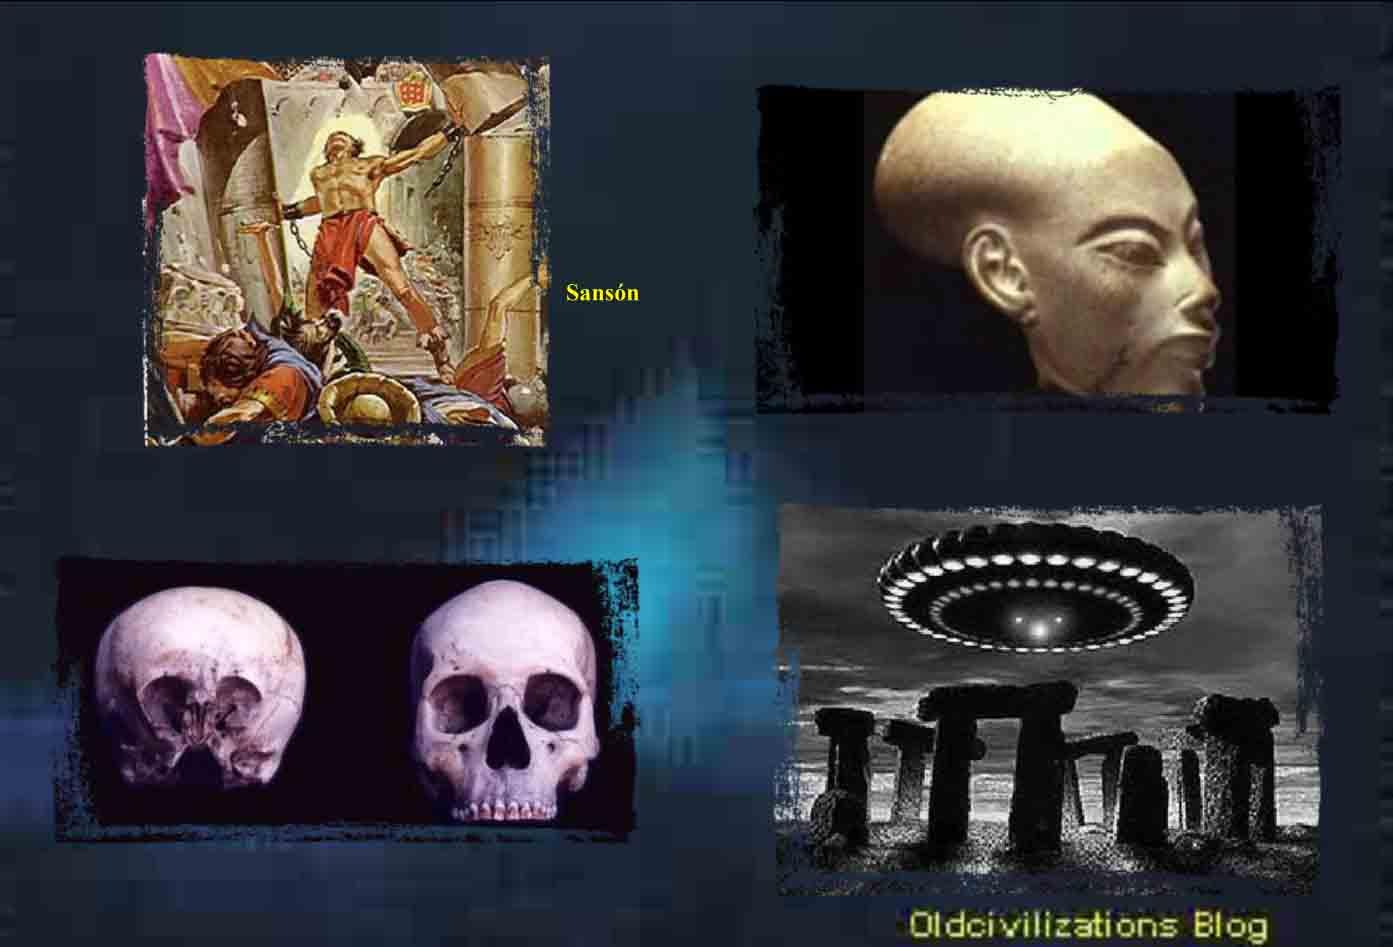 Fisicas lemurianos caracteristicas Un antiguo